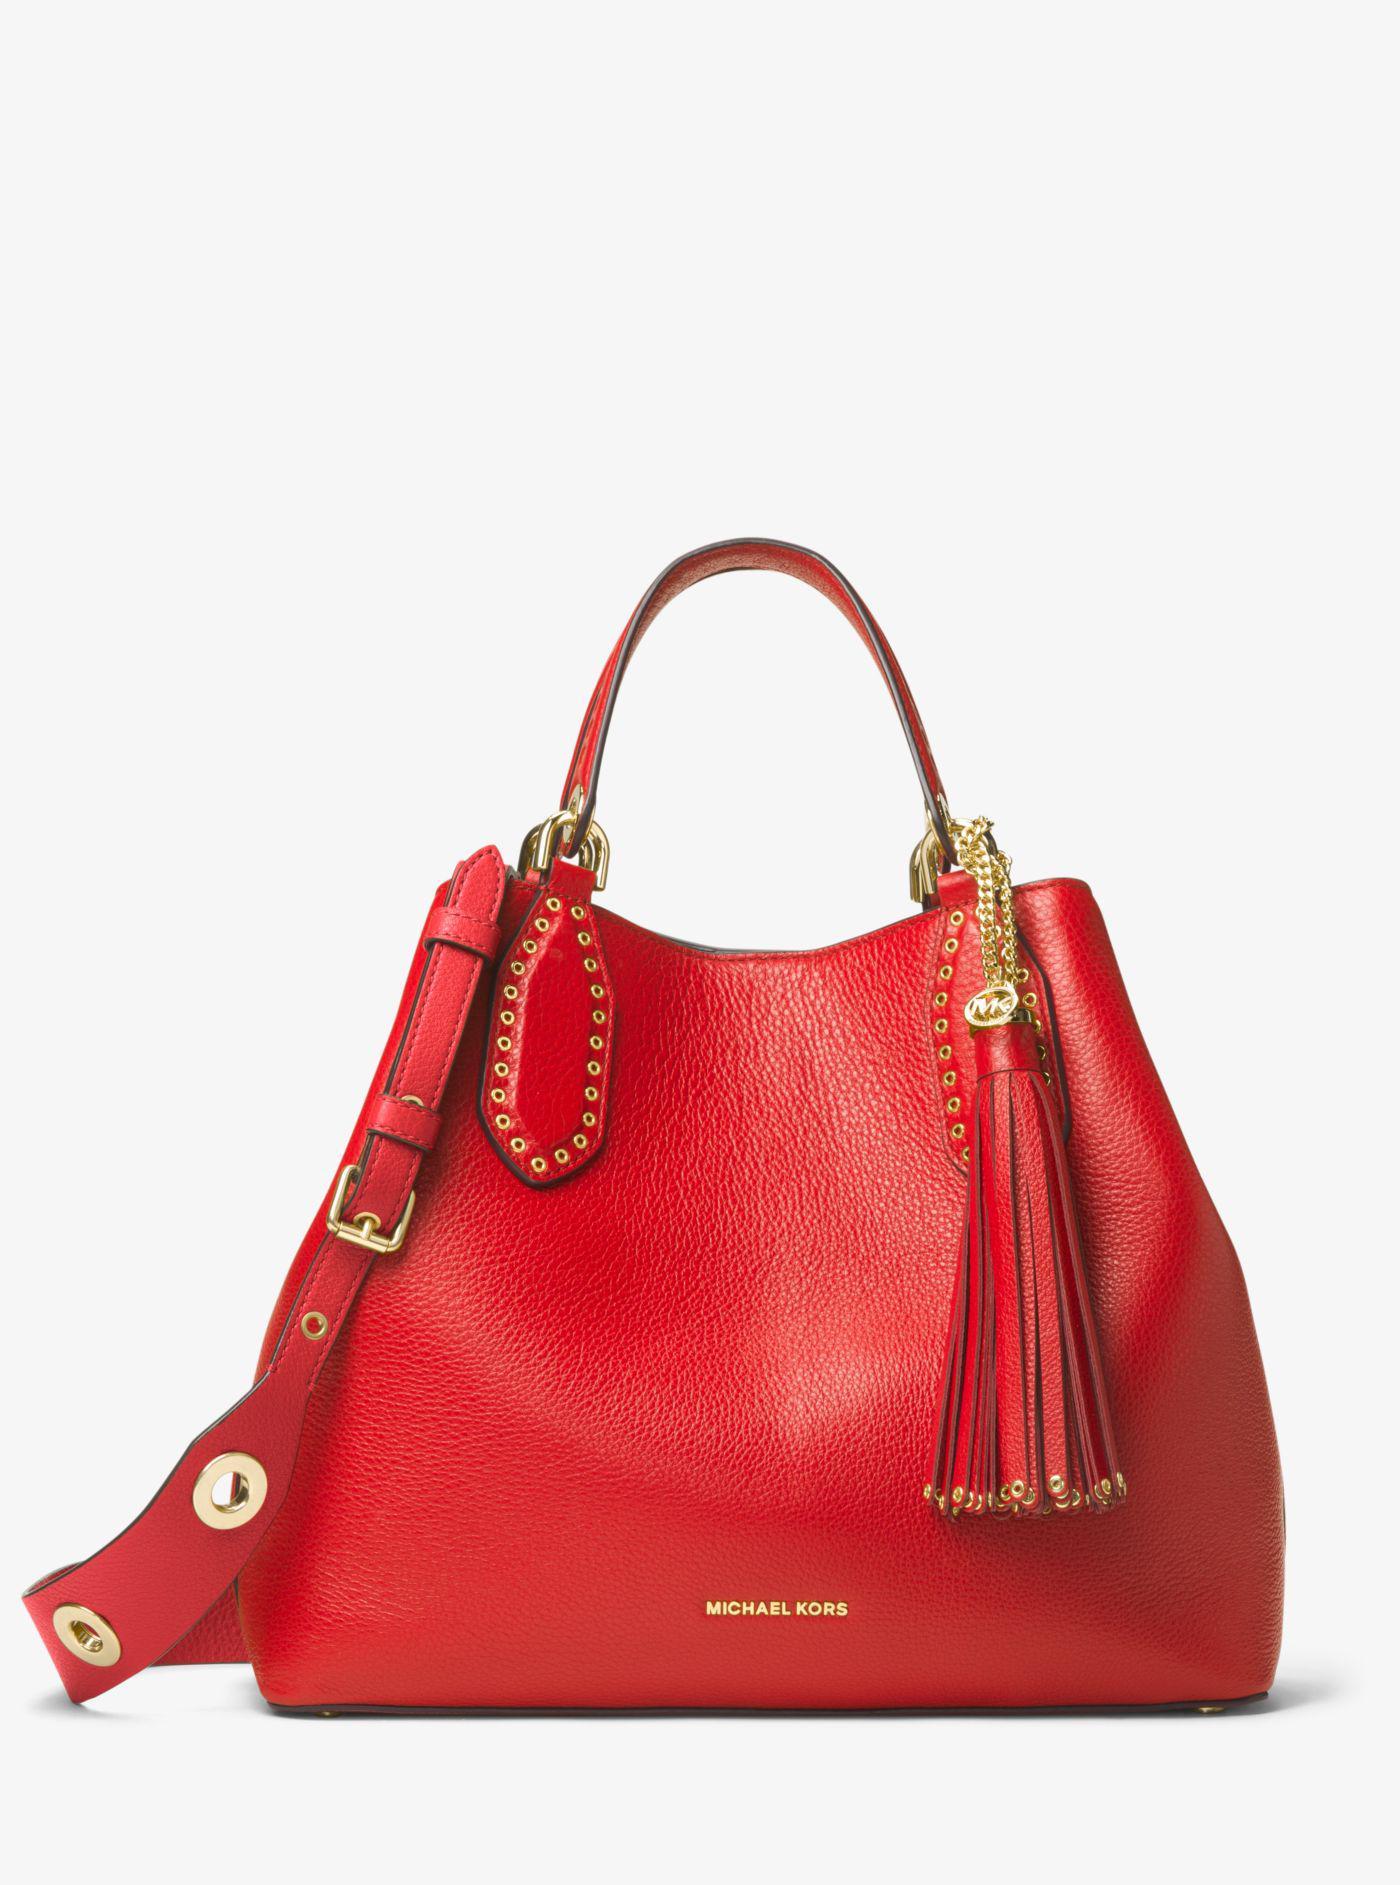 5d102d9156a5 ... greece michael kors red brooklyn large leather tote bag lyst. view  fullscreen fdb86 86fcb